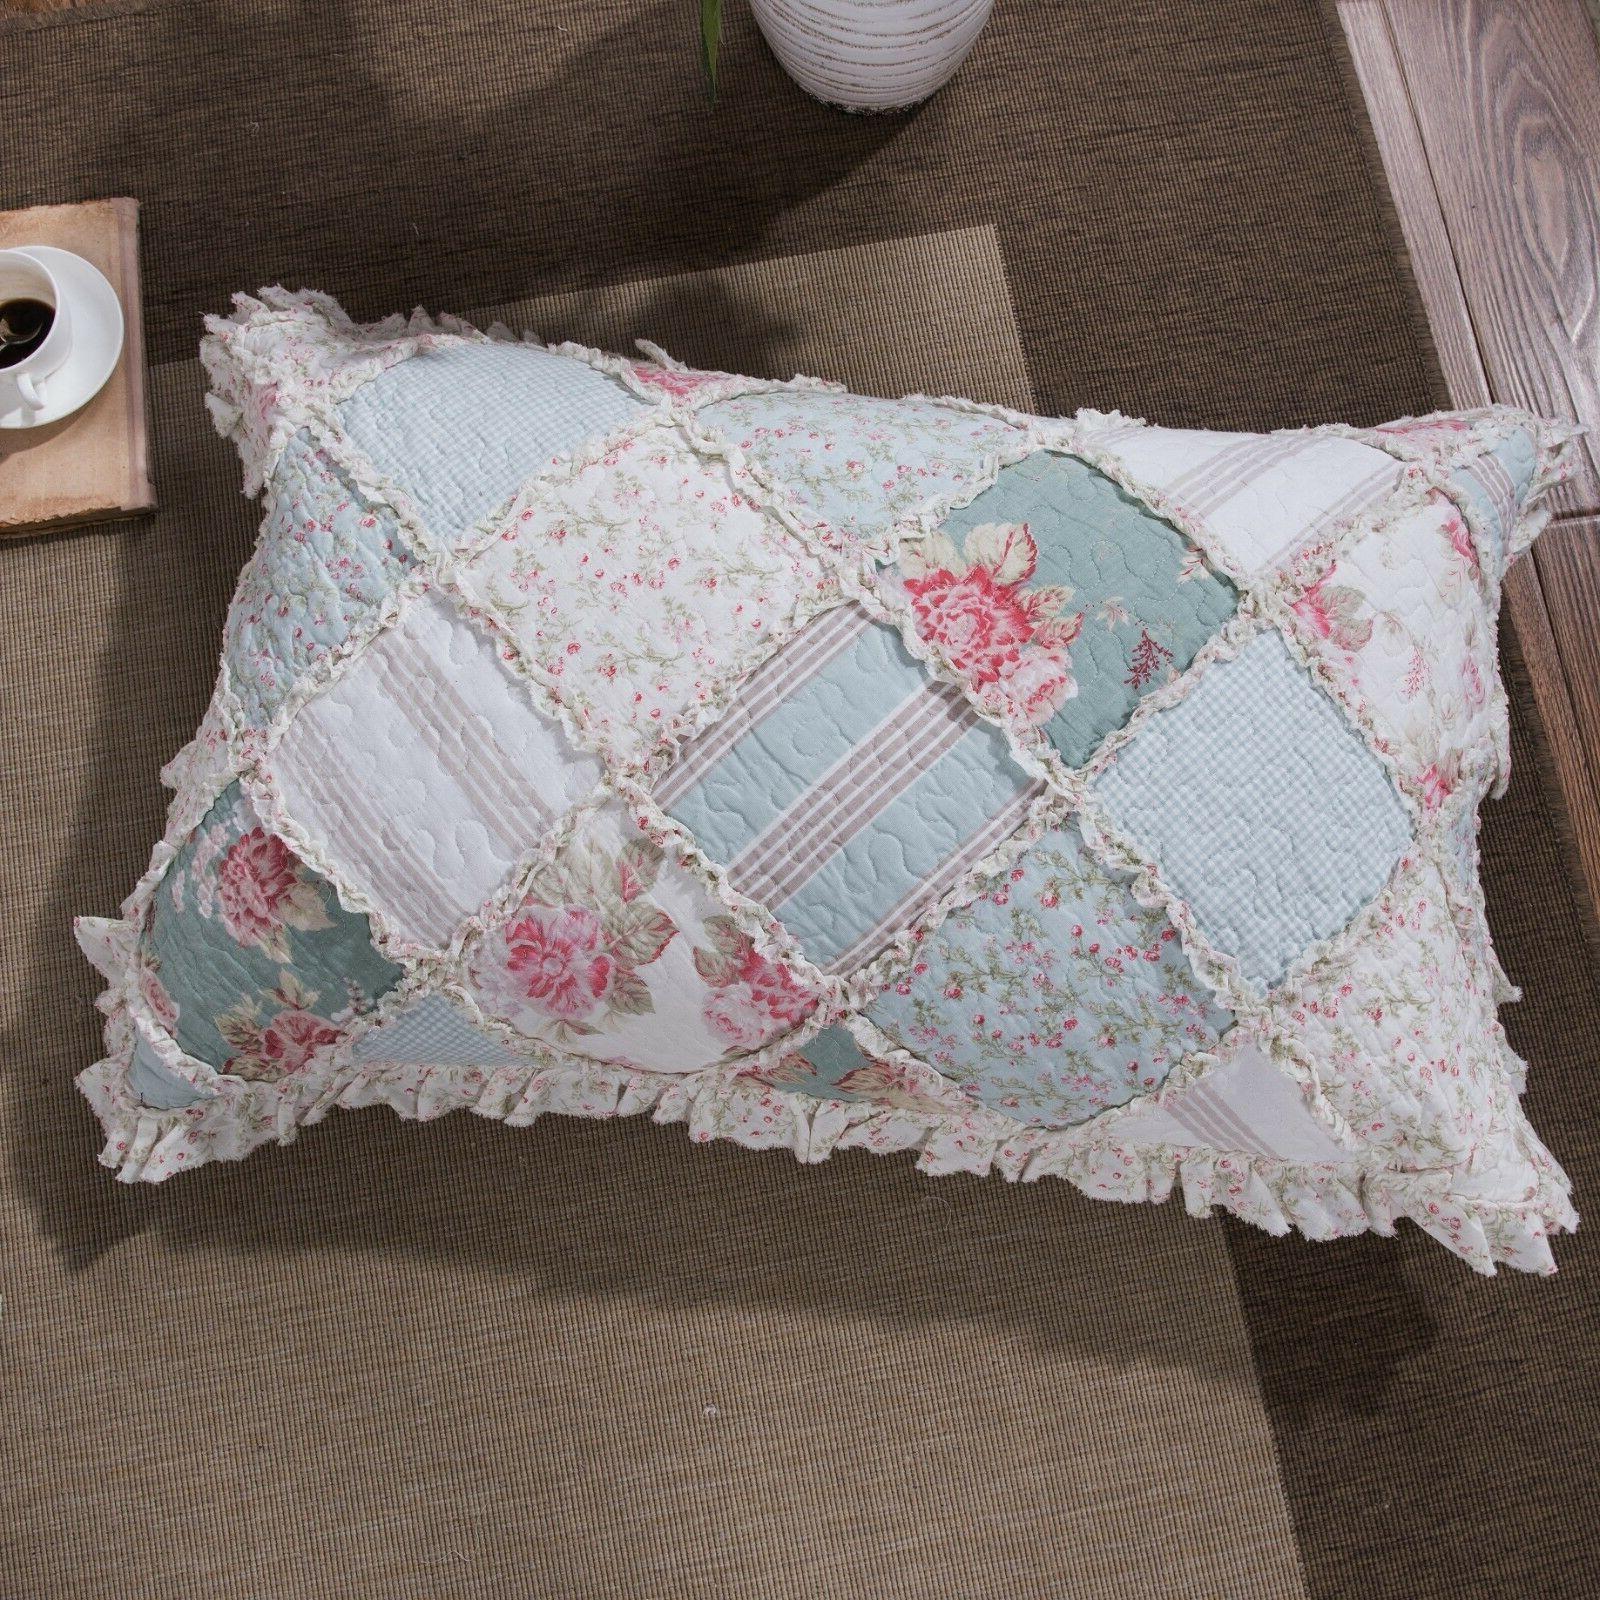 DaDa Bedding Floral Pastel Cotton Patchwork Ruffle